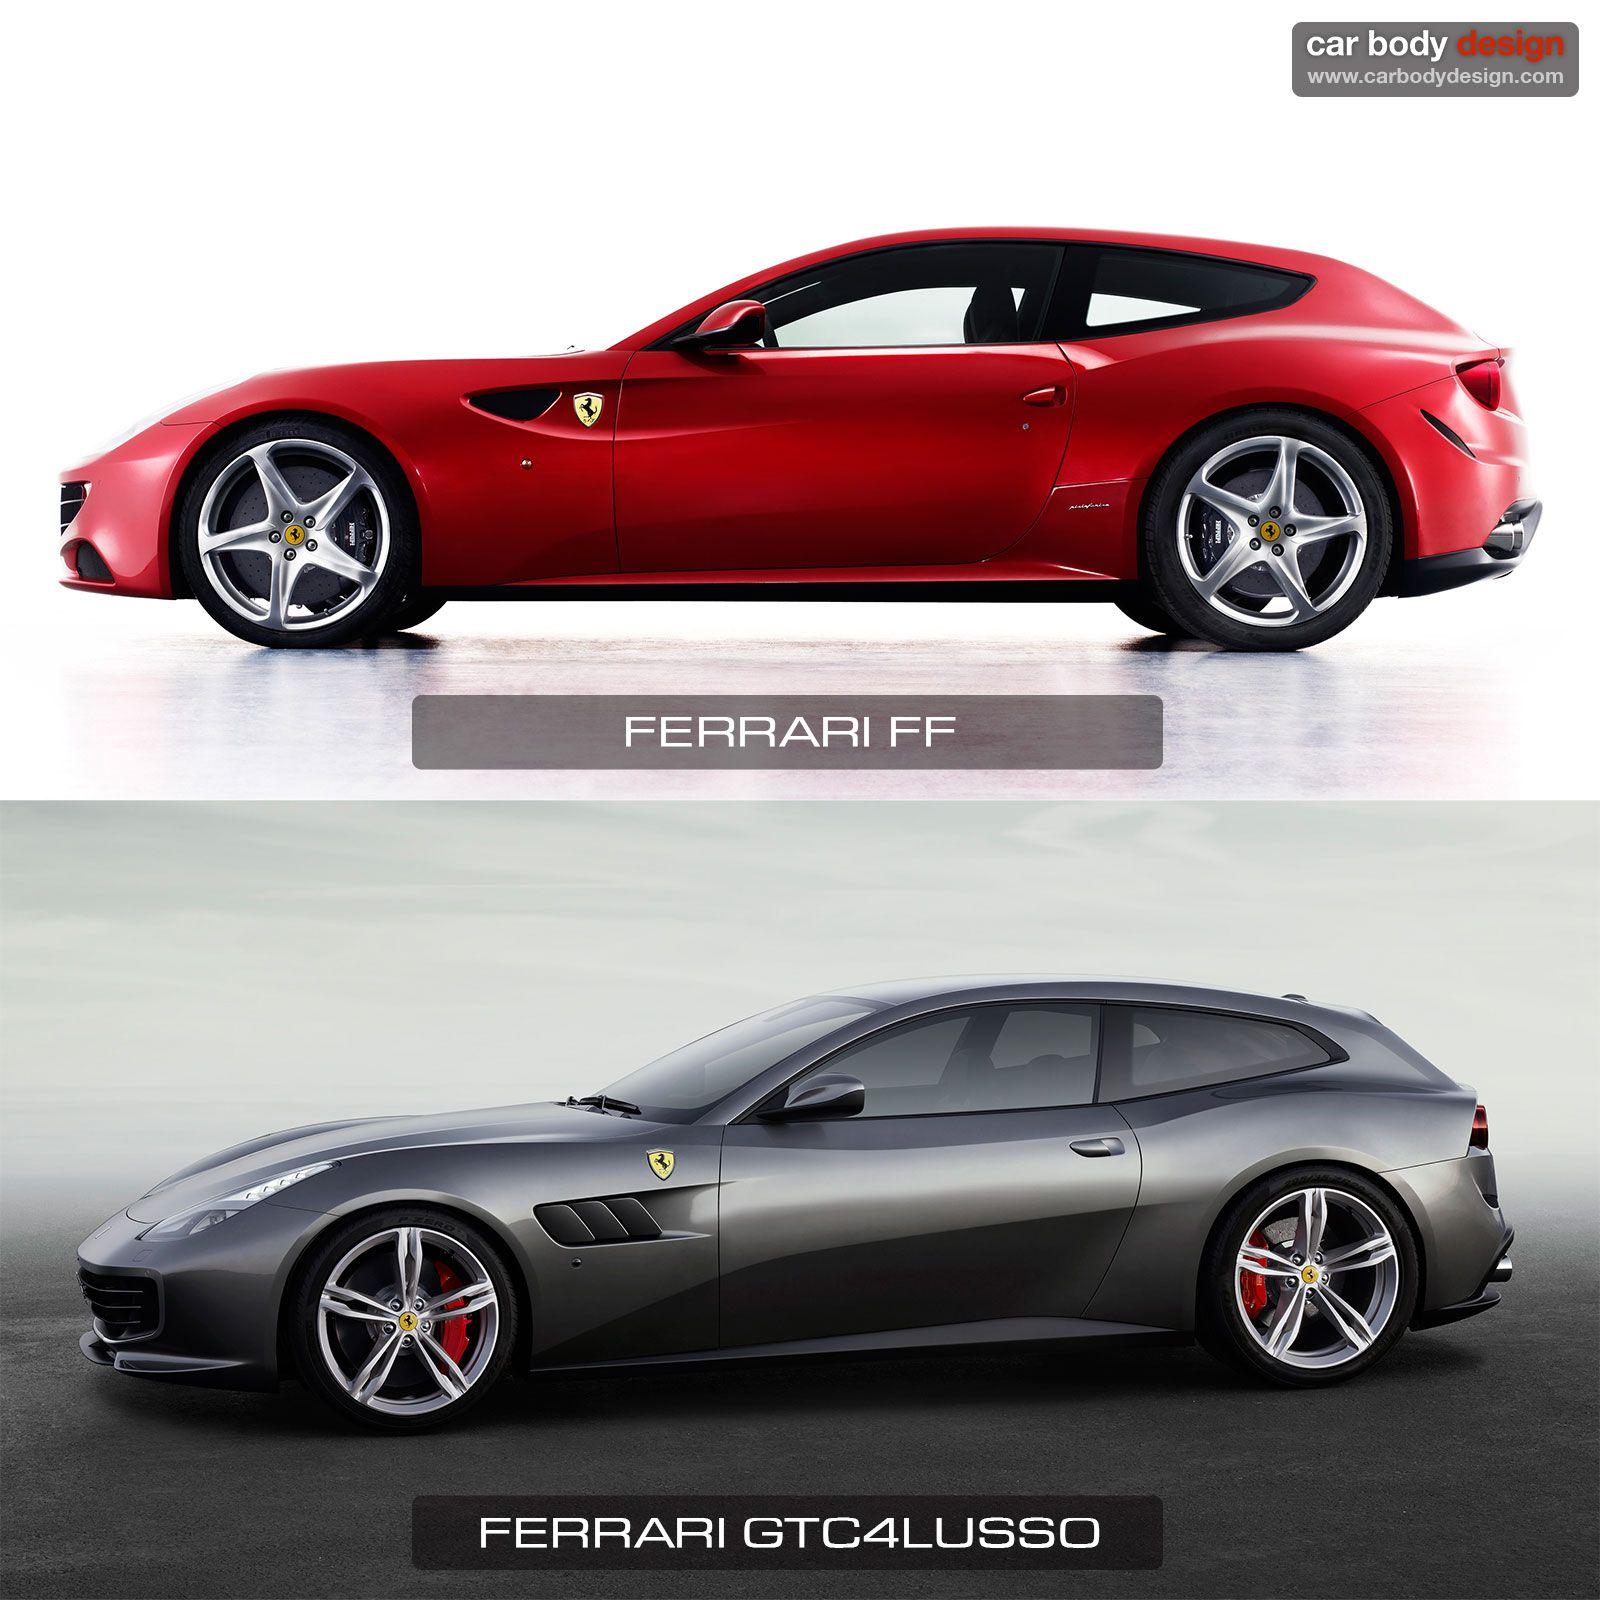 Ferari Ff Gtc4lusso Design Comparison Design Ferrari Sports Car